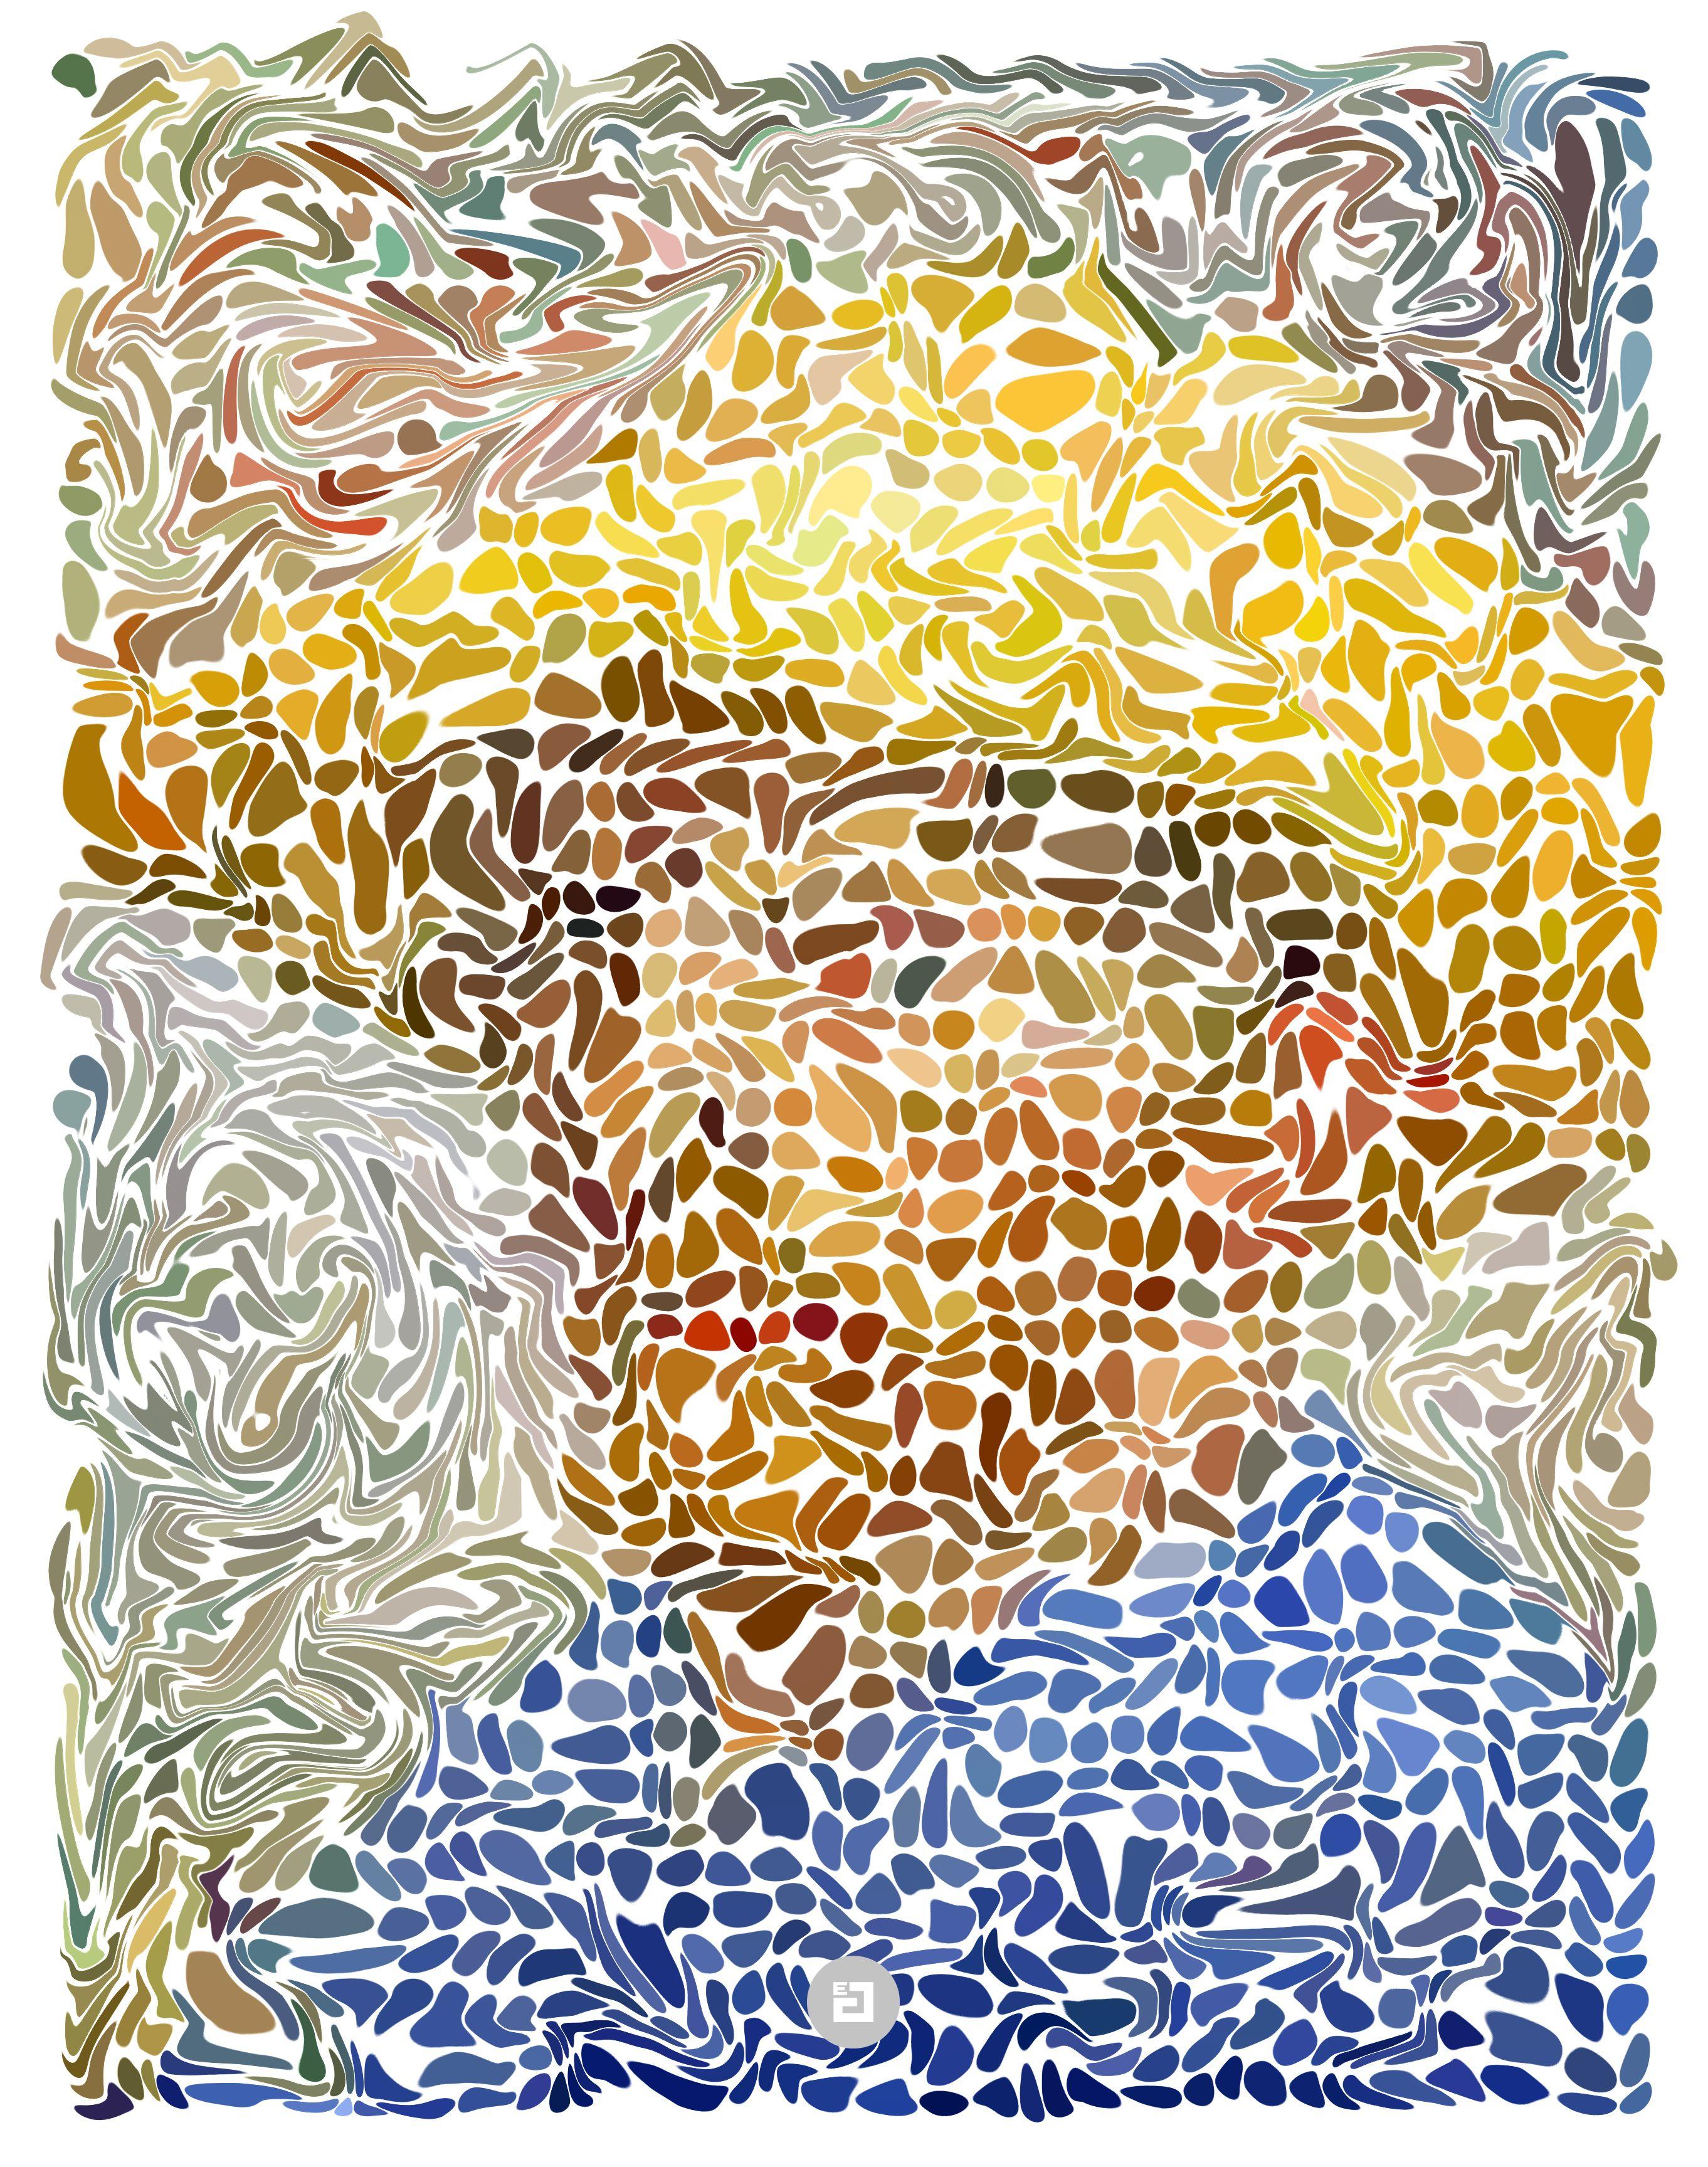 2724x3456 Fanartvincent Willem Van Gogh. By ~jayve1 Digital Art Vector